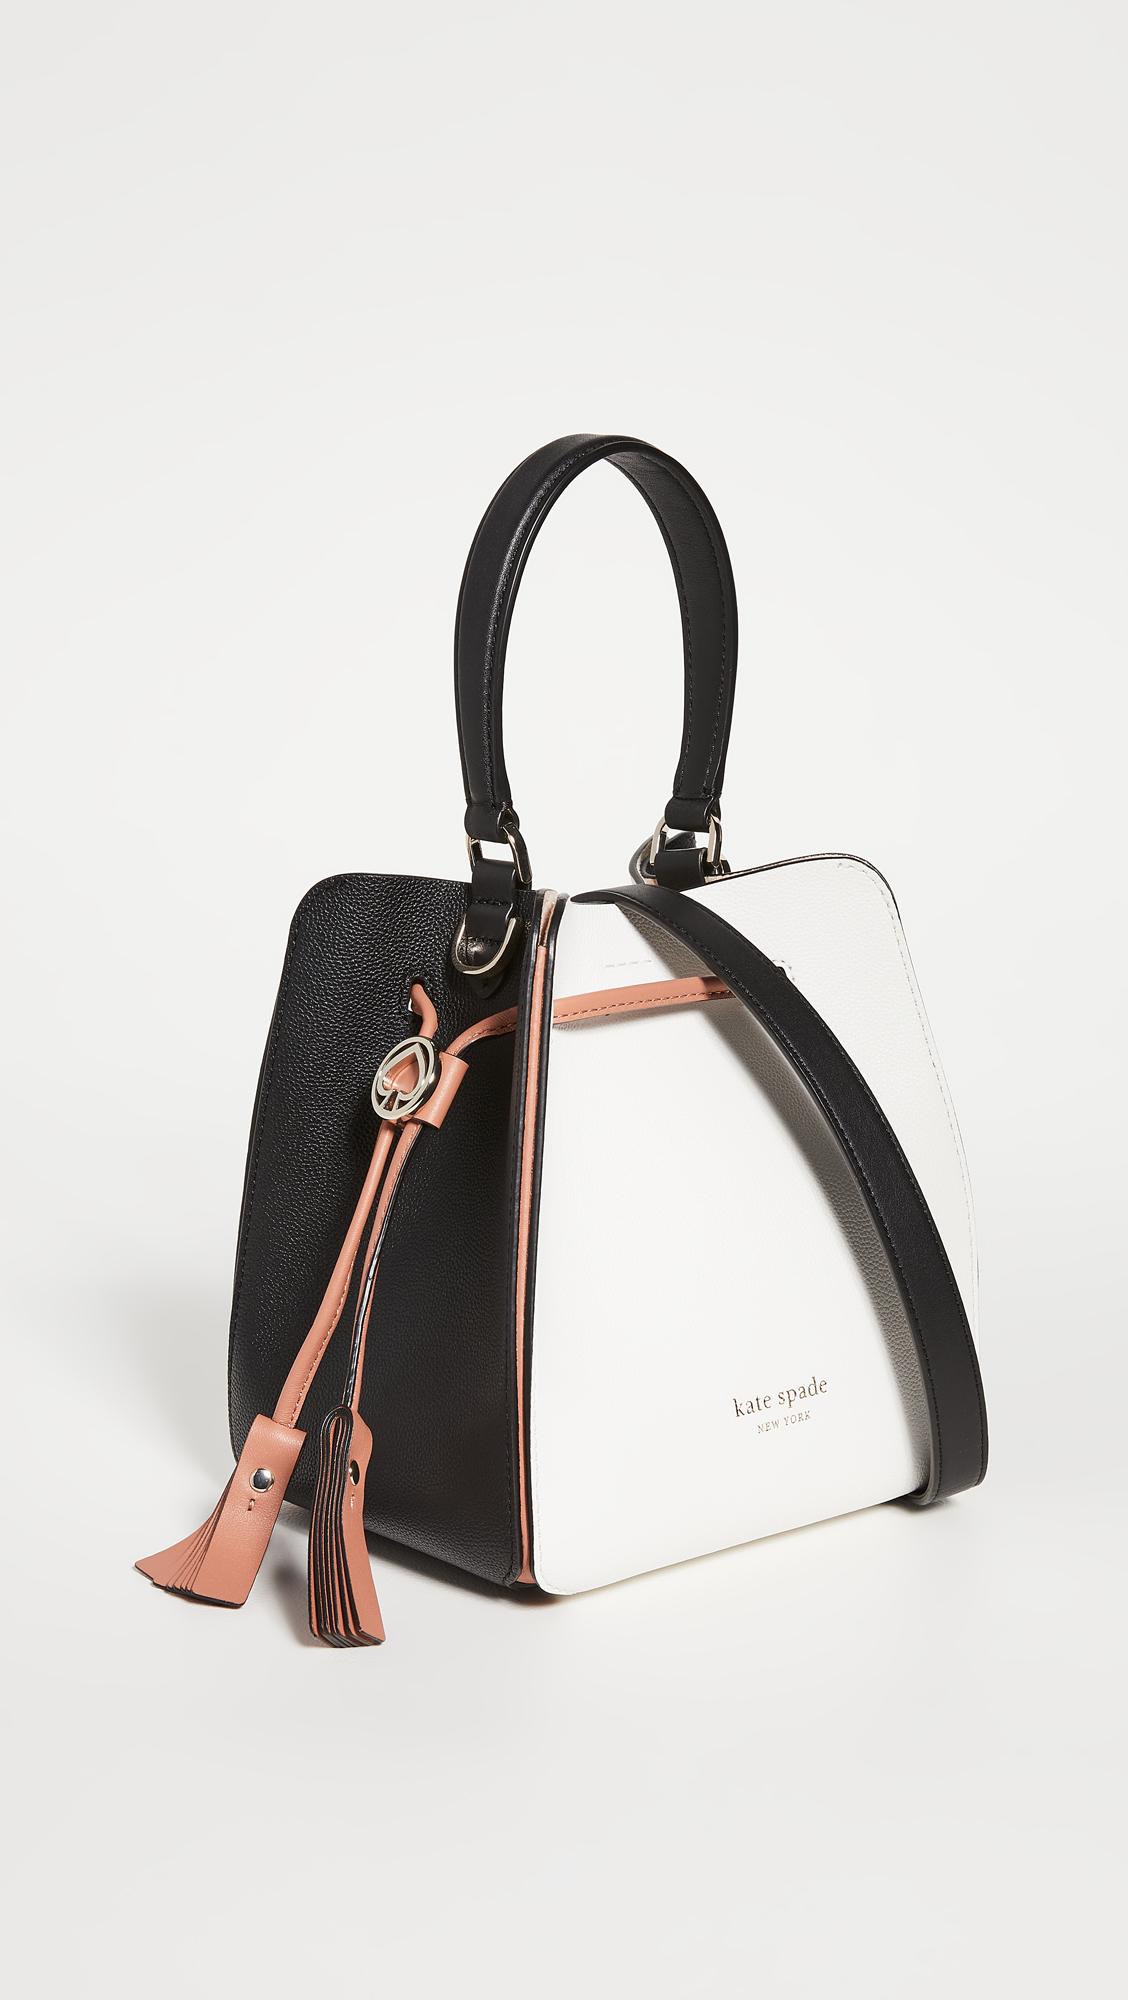 Kate Spade New York Boxy Small Bucket Bag